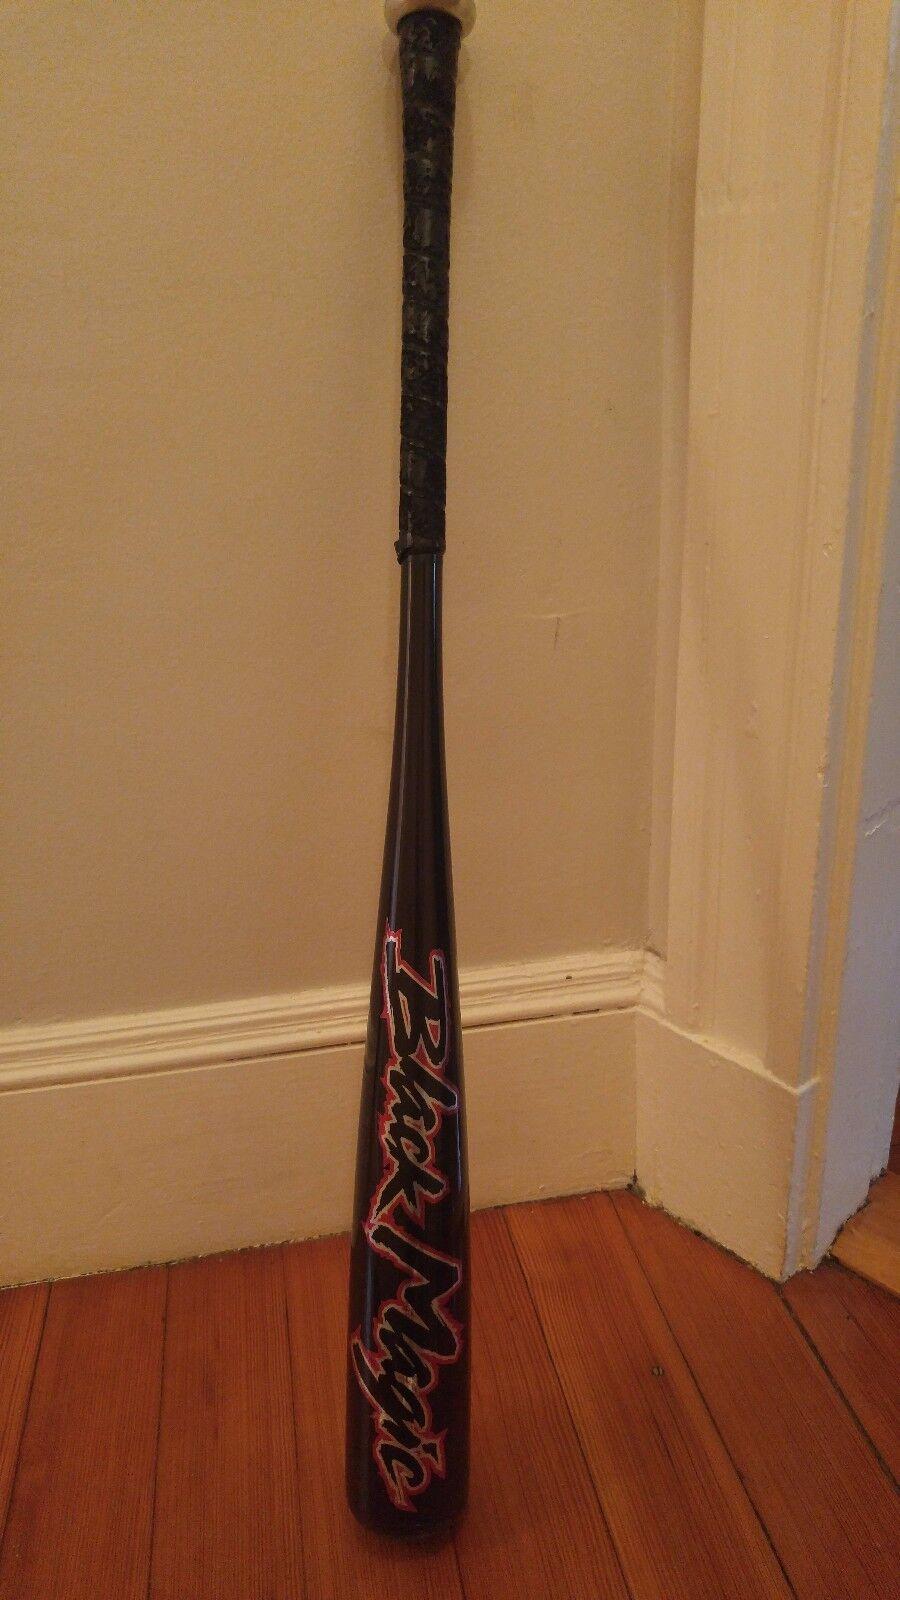 Easton Magia Negra BX19 bate bate bate de béisbol 2-3/4